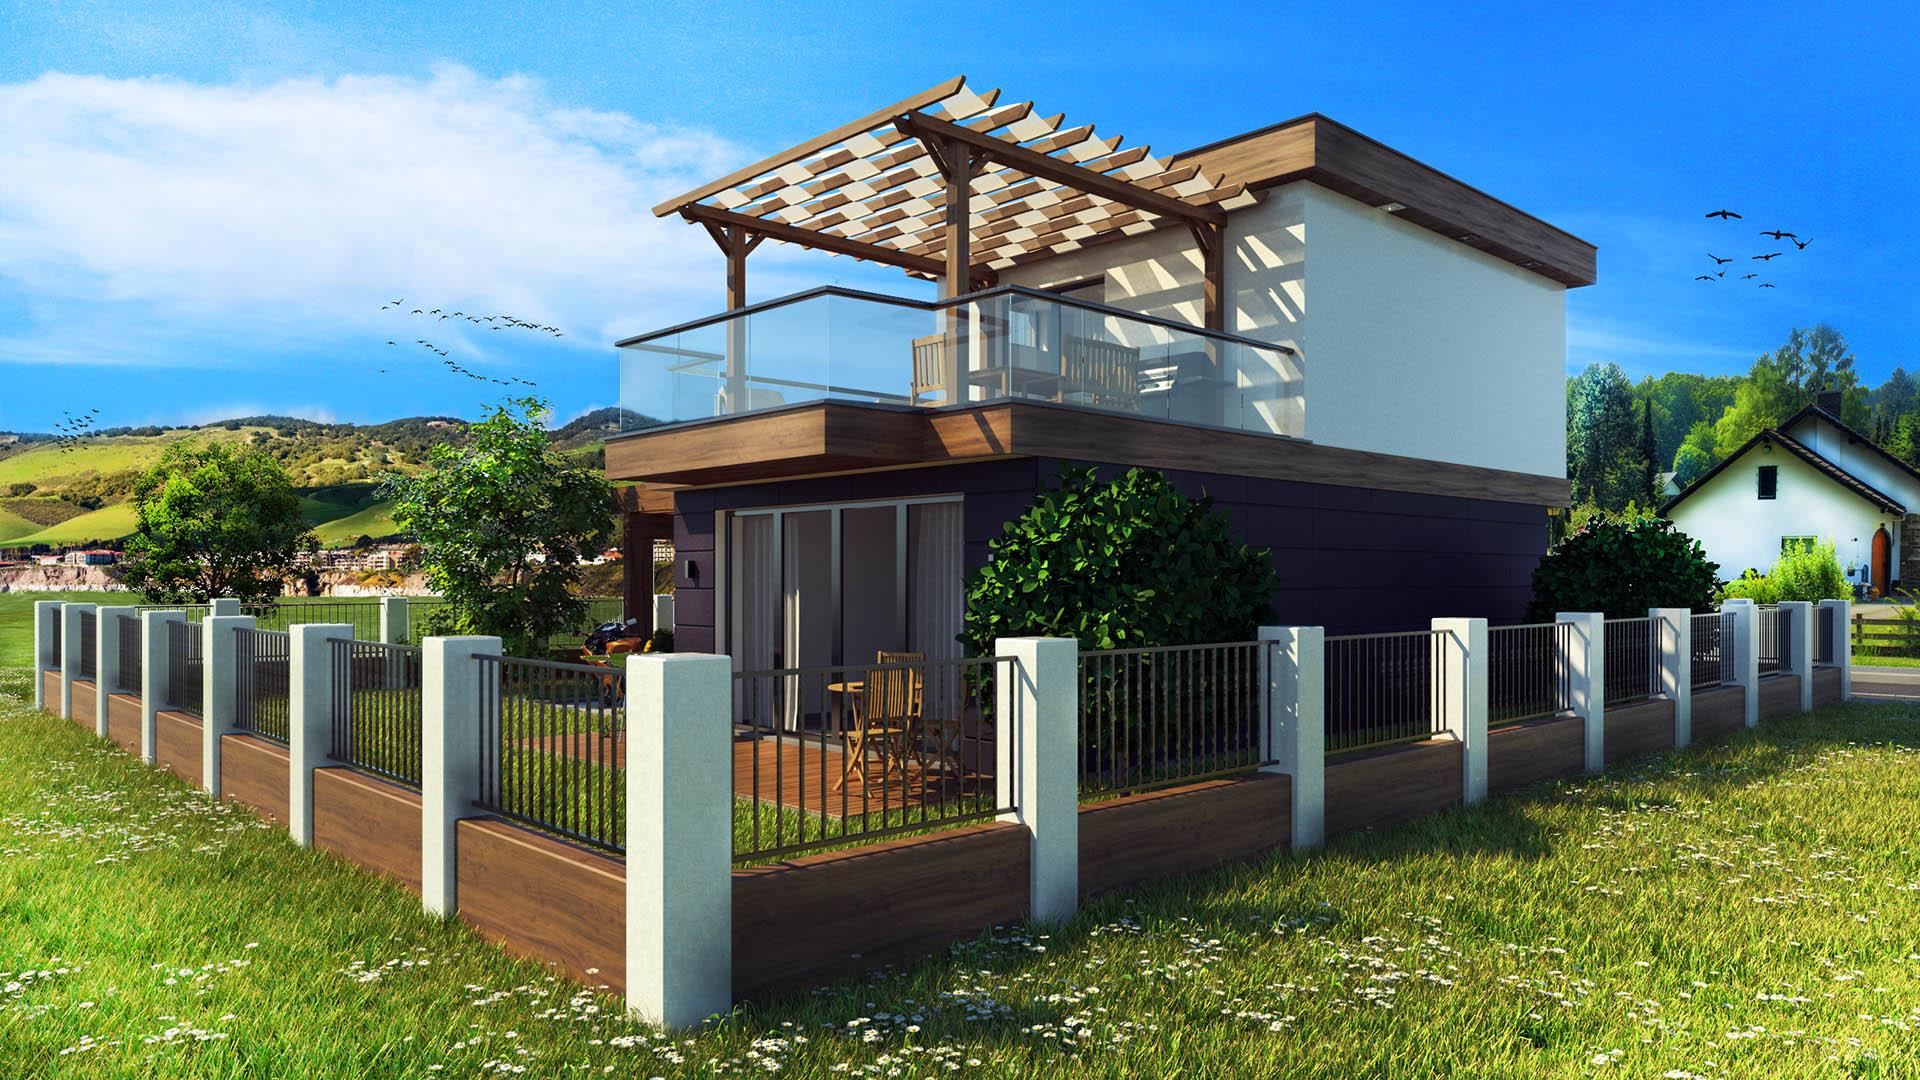 greece-house-plaka-reviera-olympian-krasimir-kapitanov-architect-project-design